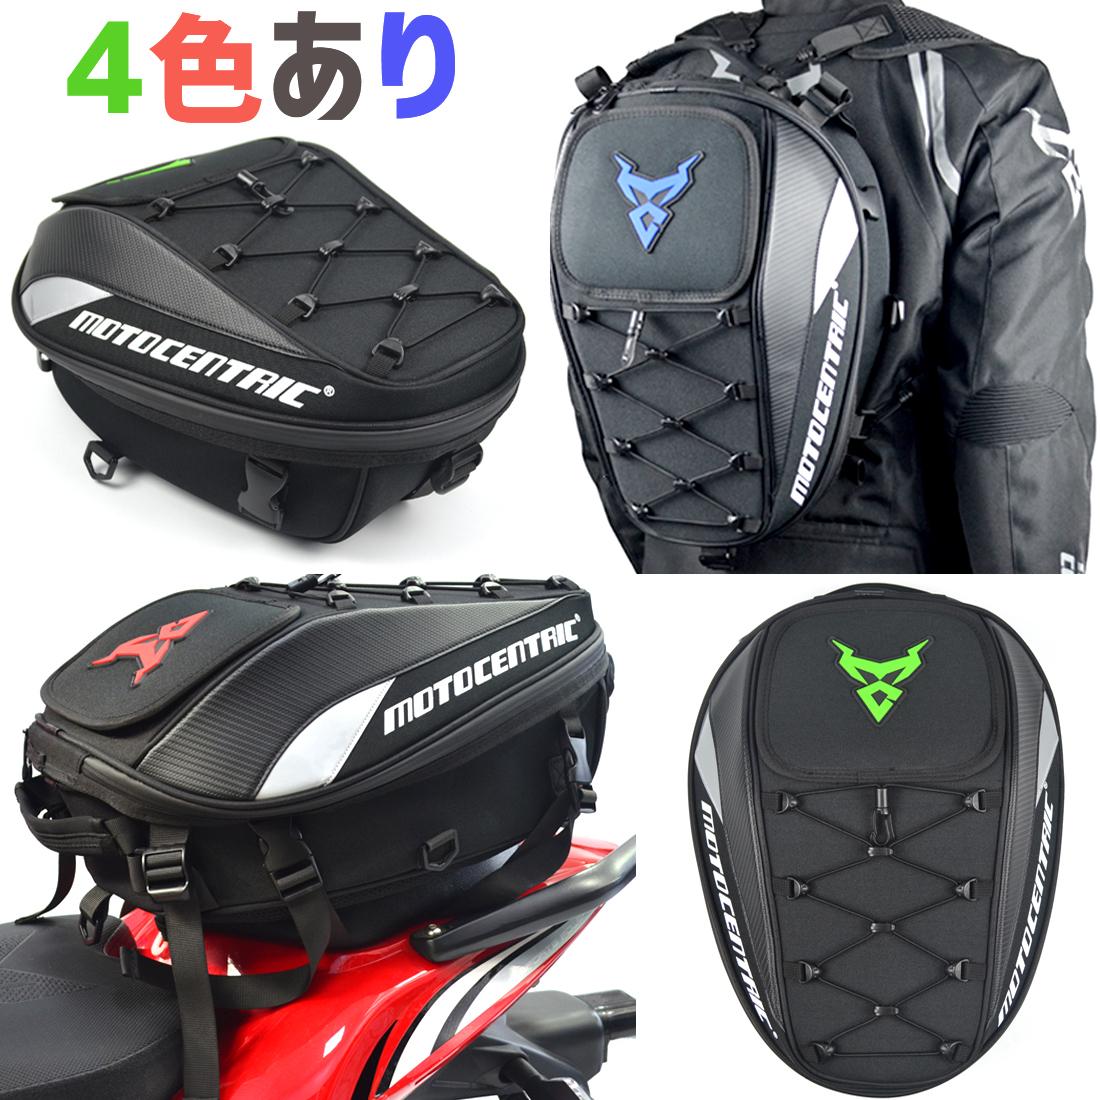 MOTOCENTRIC オートバイ リュック サック アウトドア 撥水 ツーリング レインカバー付き シートバッグ バックパックヘルメットバッグ バイク用 多機能 防水 耐摩 MC0102